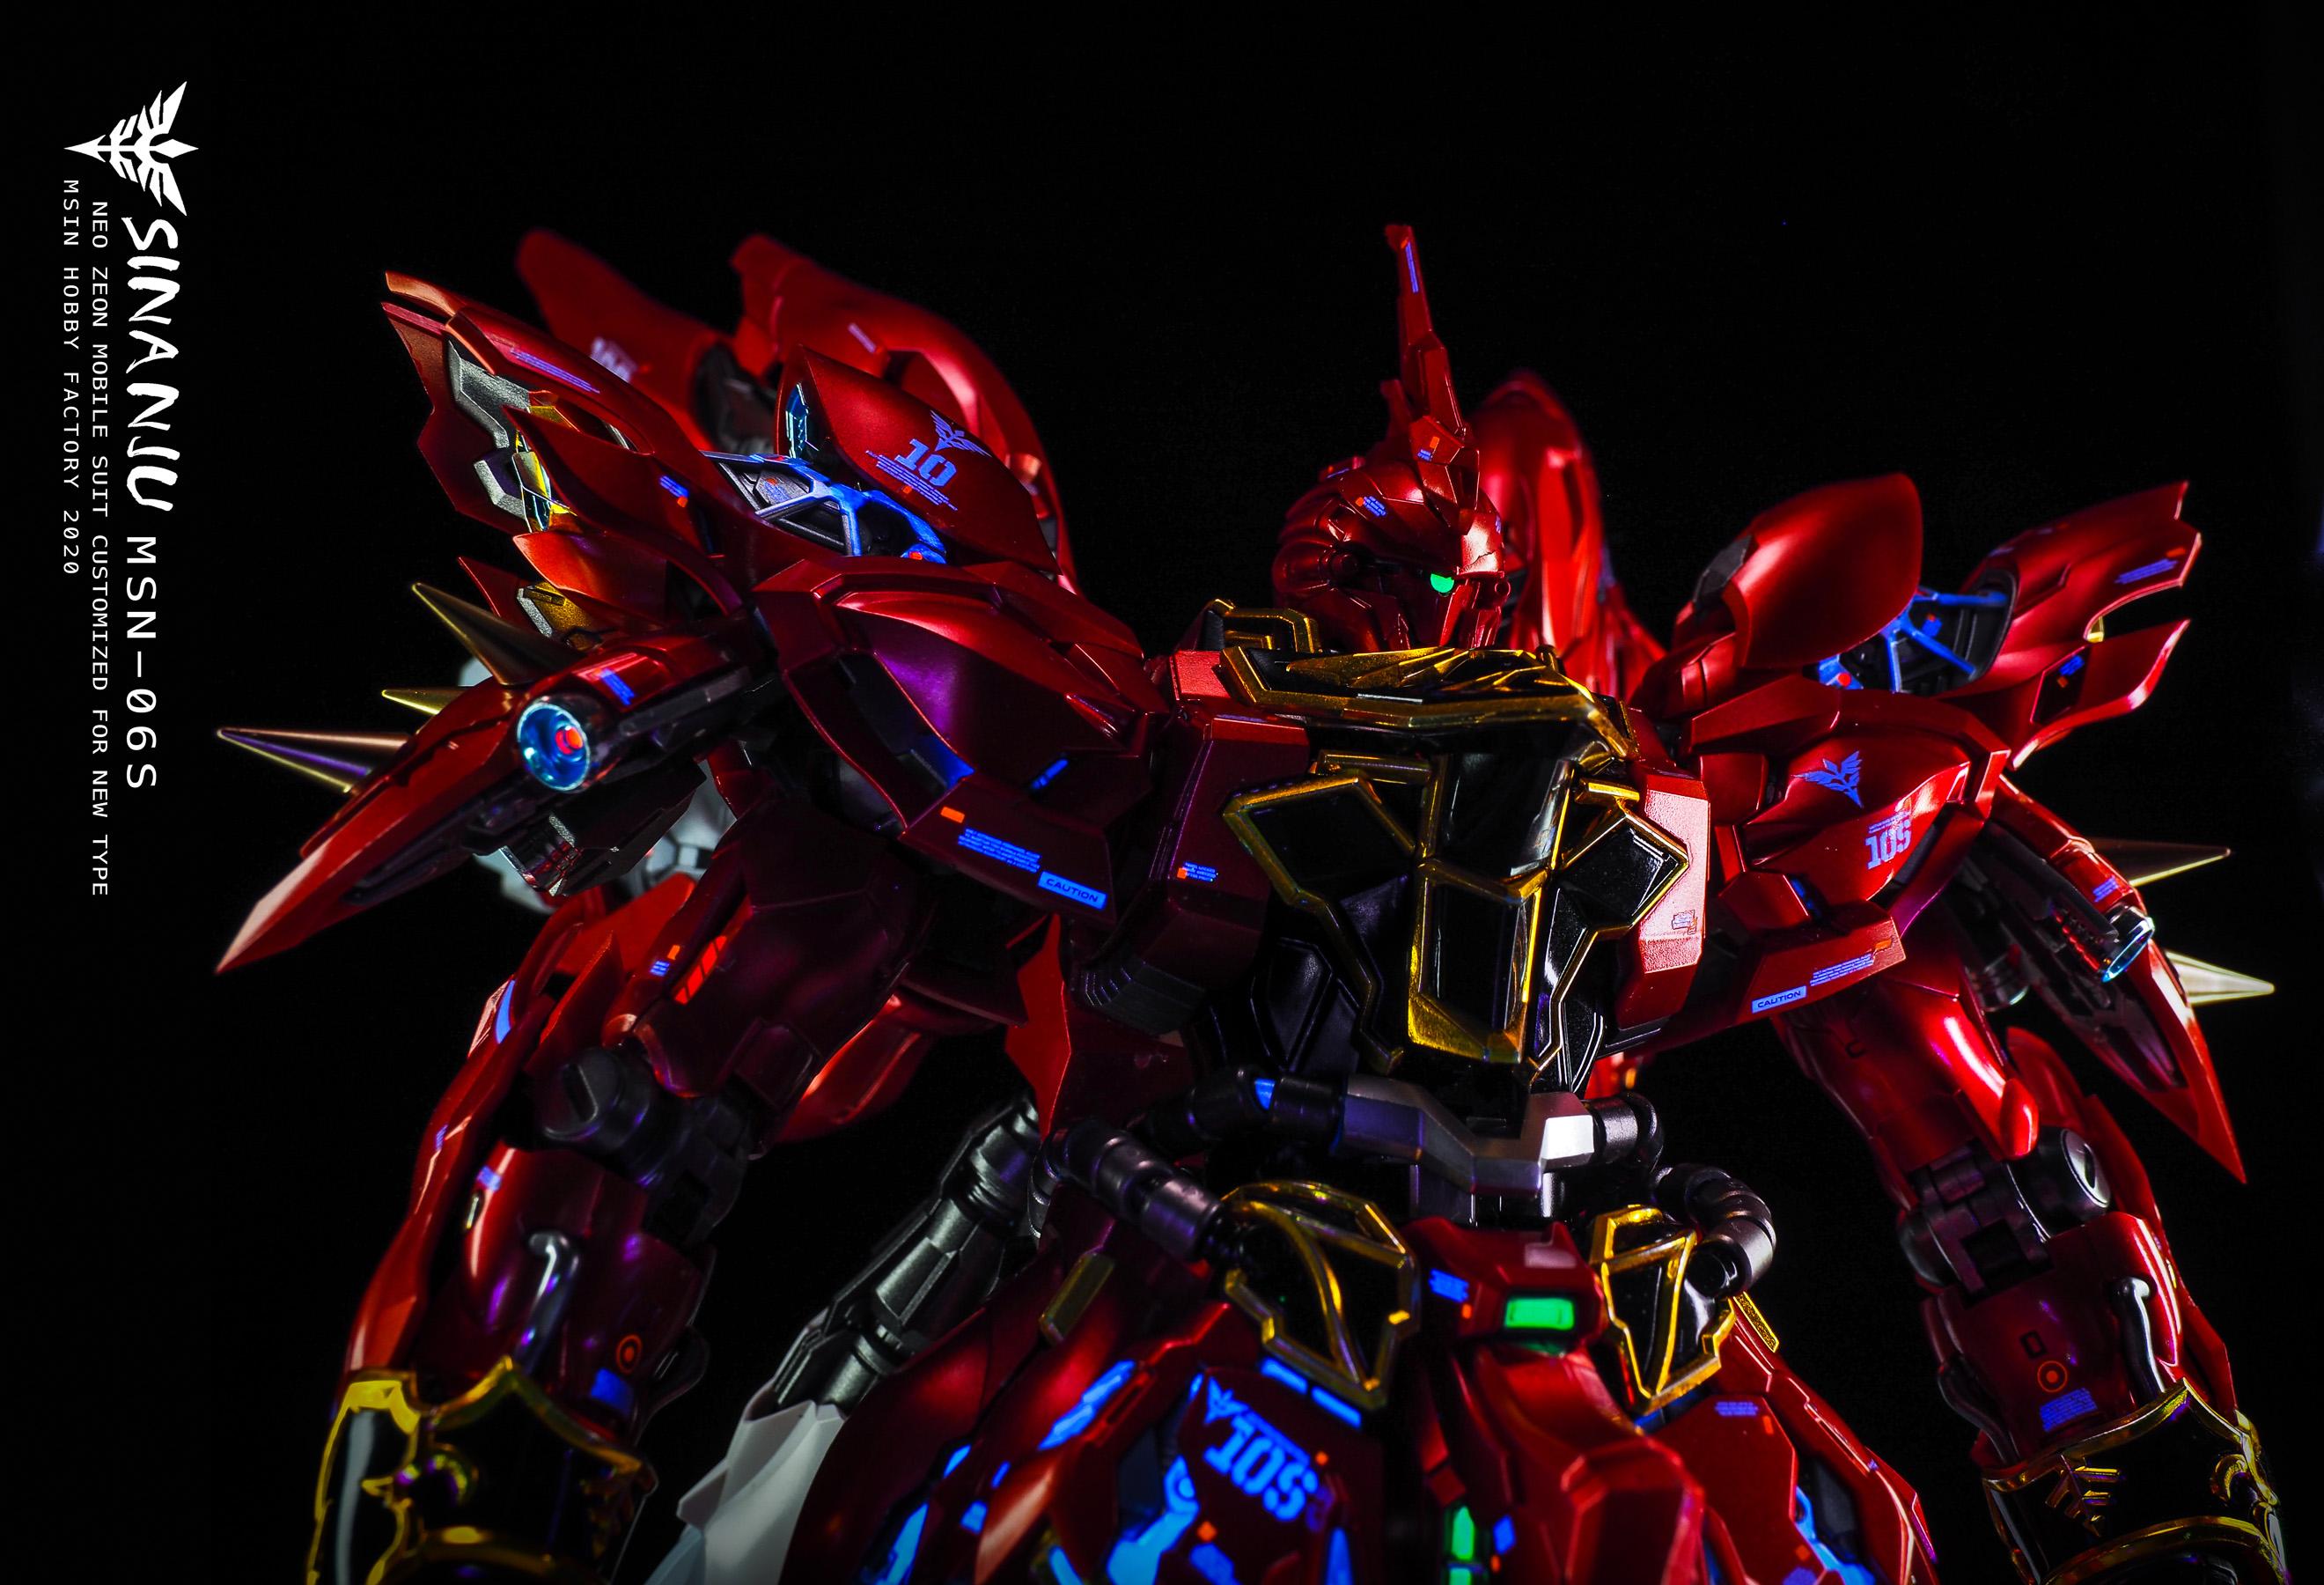 S437_6_takumi_sinanju_red_017.jpg